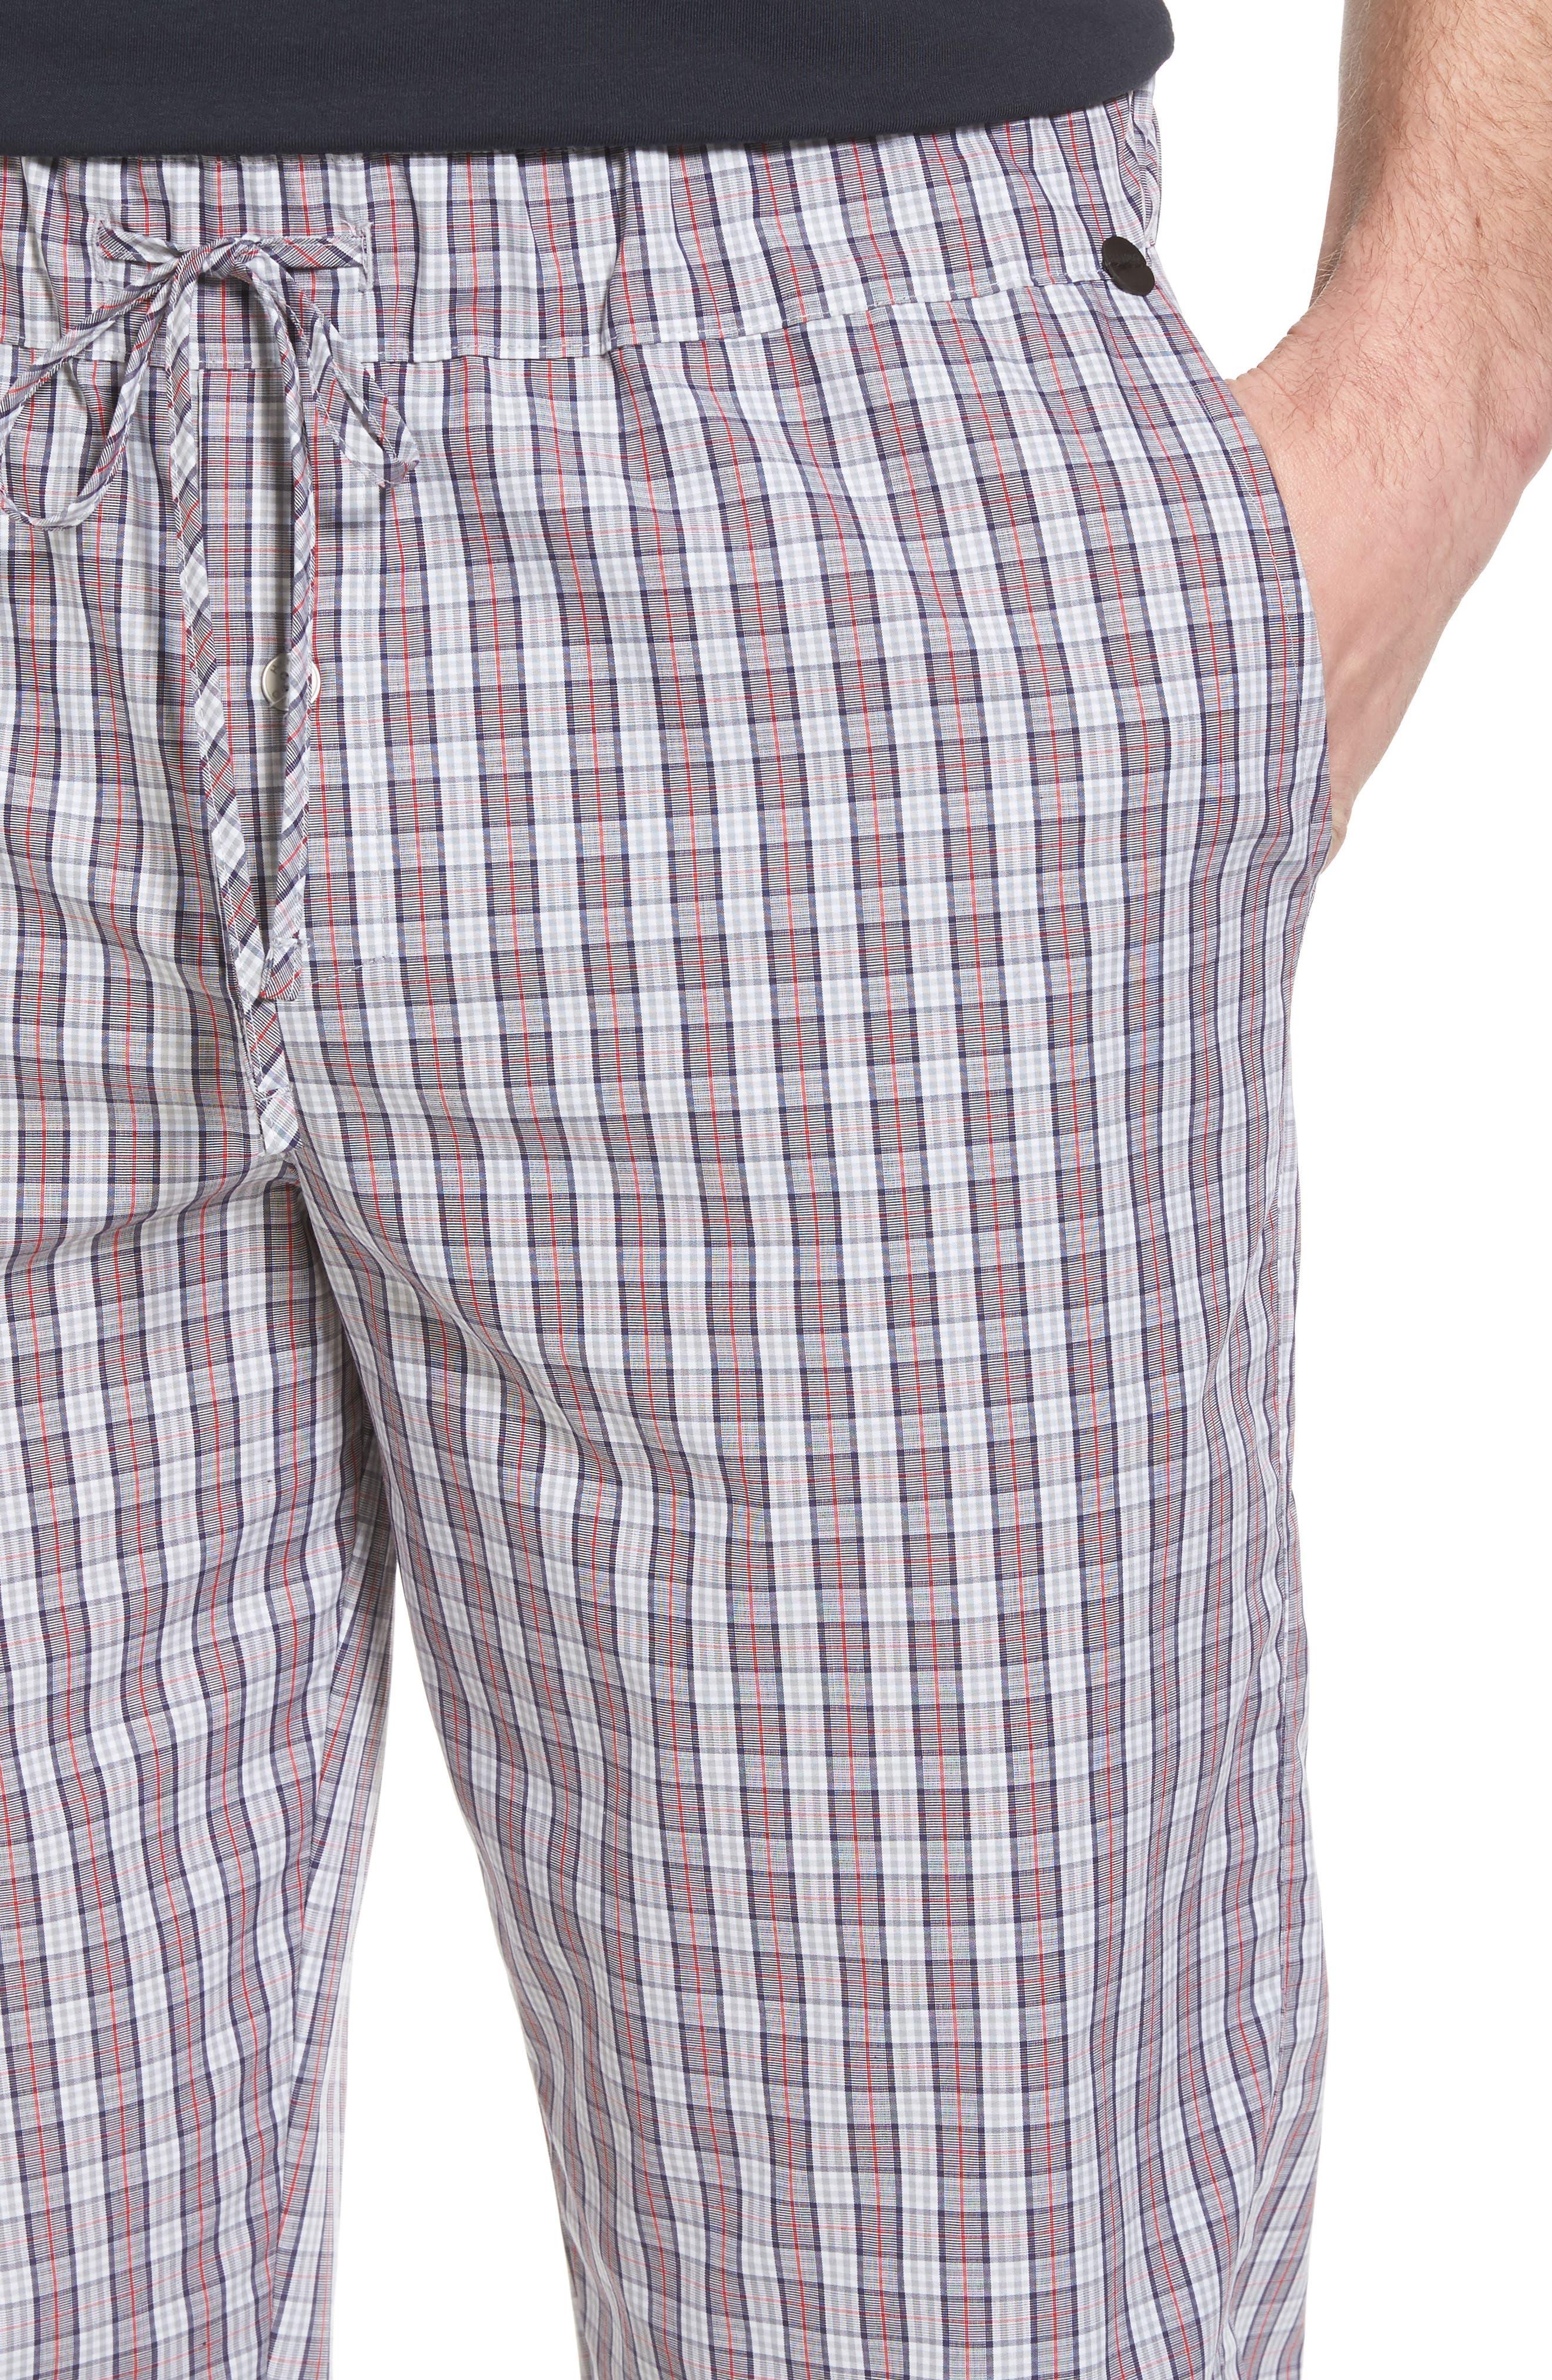 Night & Day Woven Lounge Pants,                             Alternate thumbnail 4, color,                             Red Karo